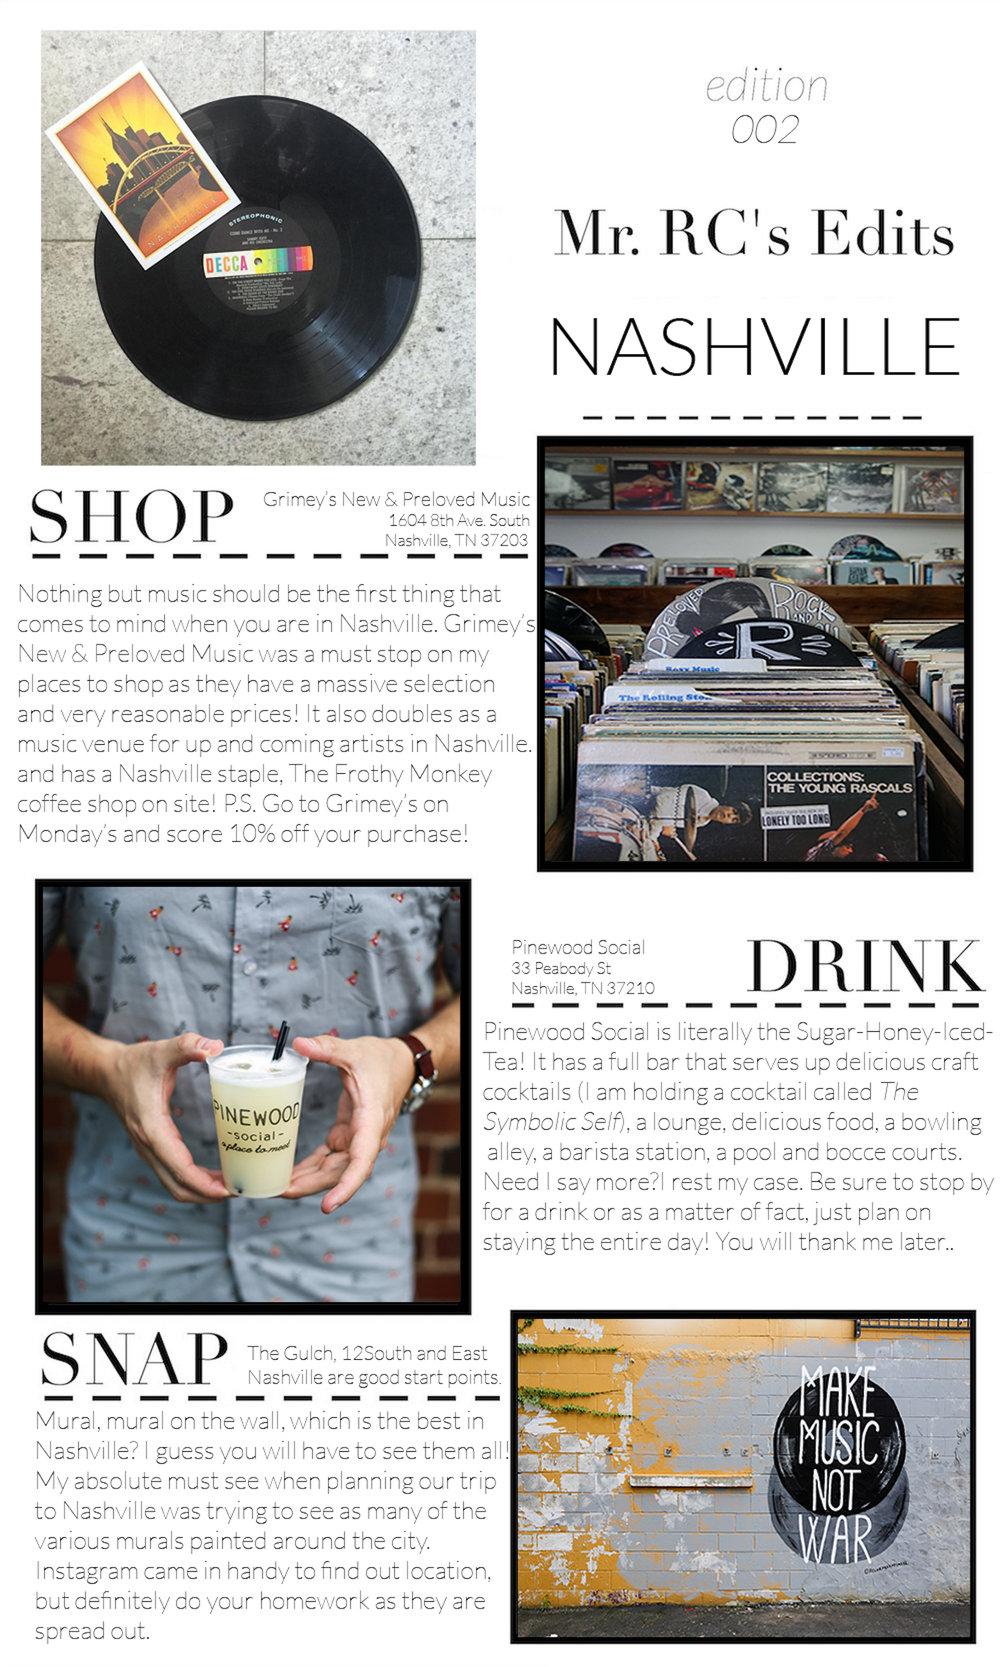 Nashville-Edits.jpg